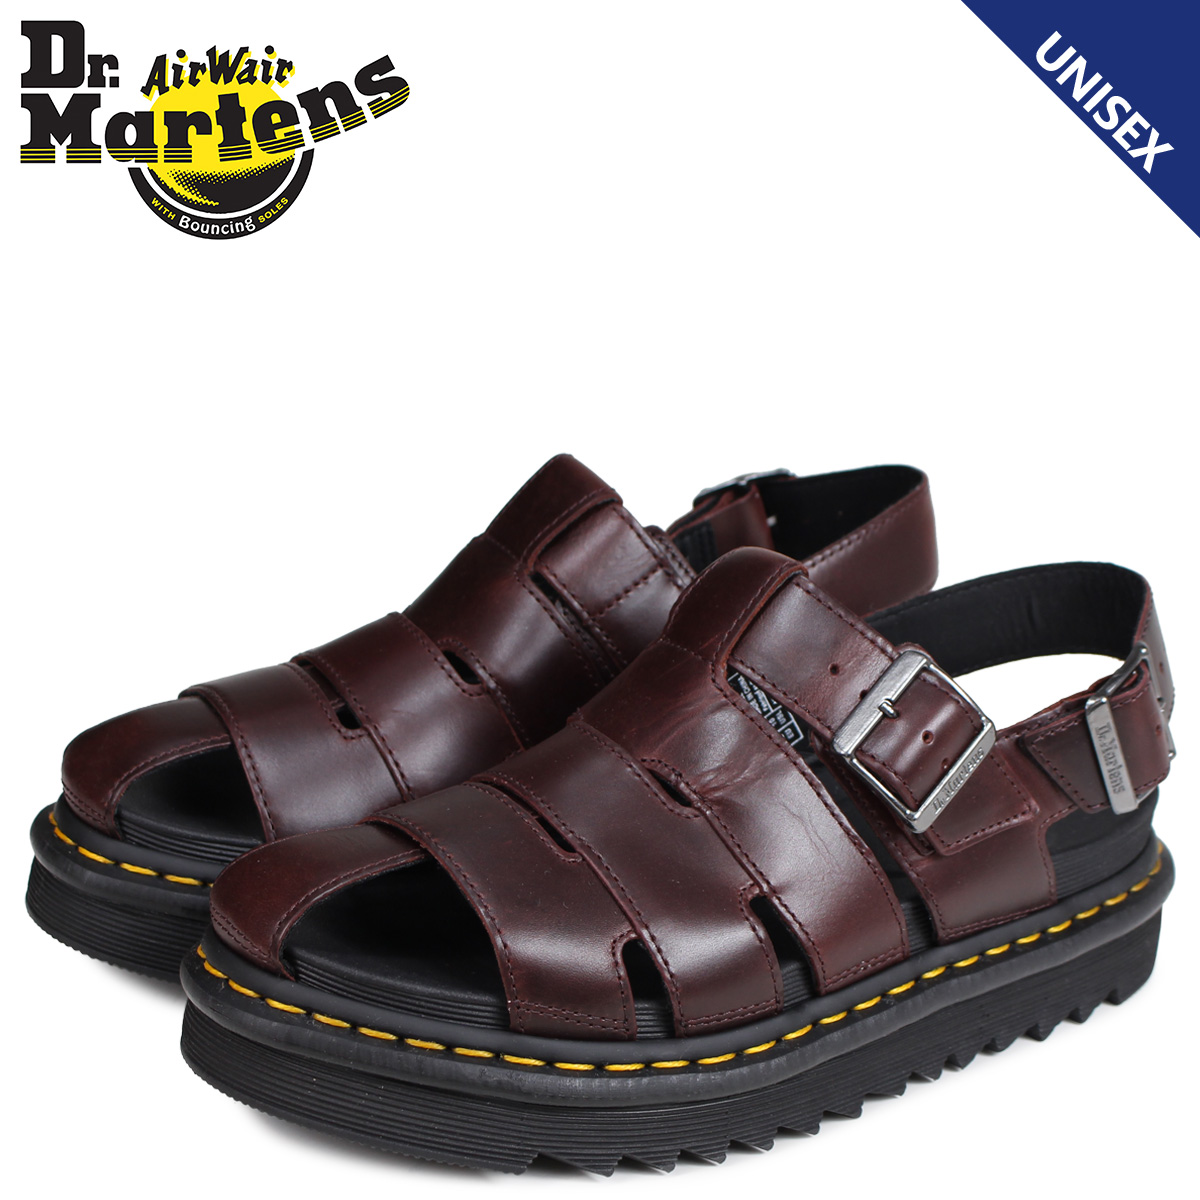 professional sale best deals on how to buy Dr.Martens doctor Martin sandals Abel fisherman men gap Dis ABEL brown  R24522211